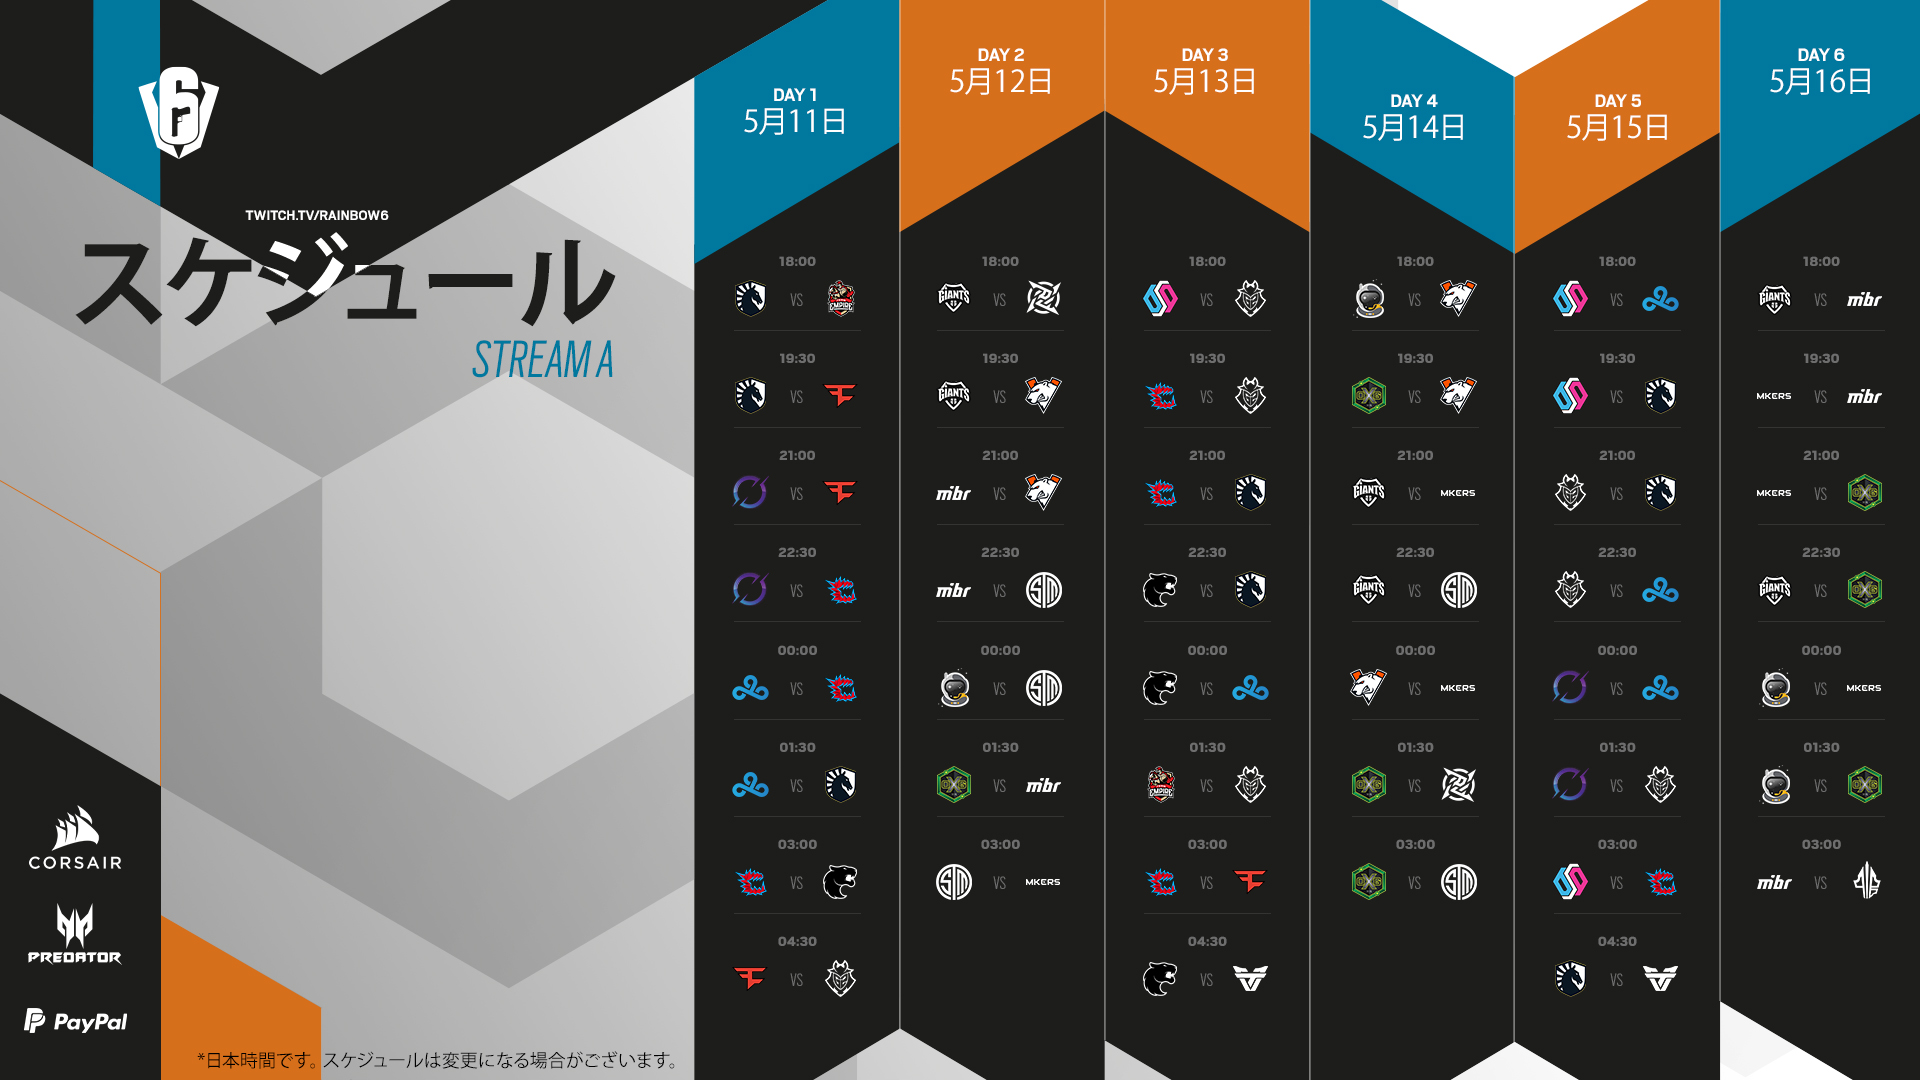 SI2021_Schedule_week_groupstage_StreamA